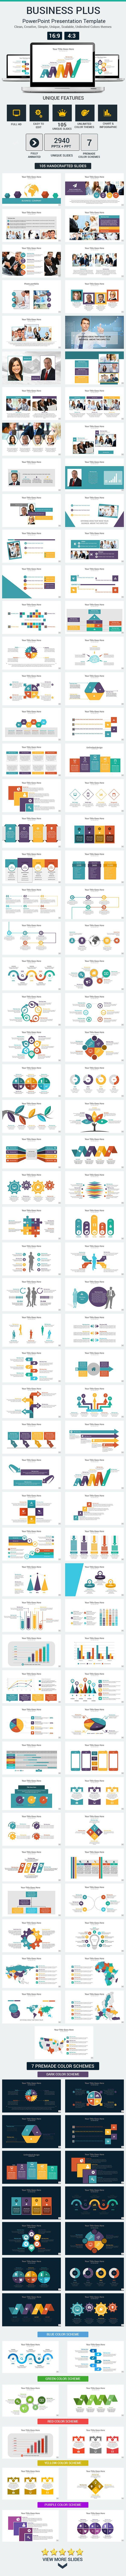 Business Plus PowerPoint Presentation Template #design #slides Download: http://graphicriver.net/item/business-plus-powerpoint-presentation-template/10911892?ref=ksioks